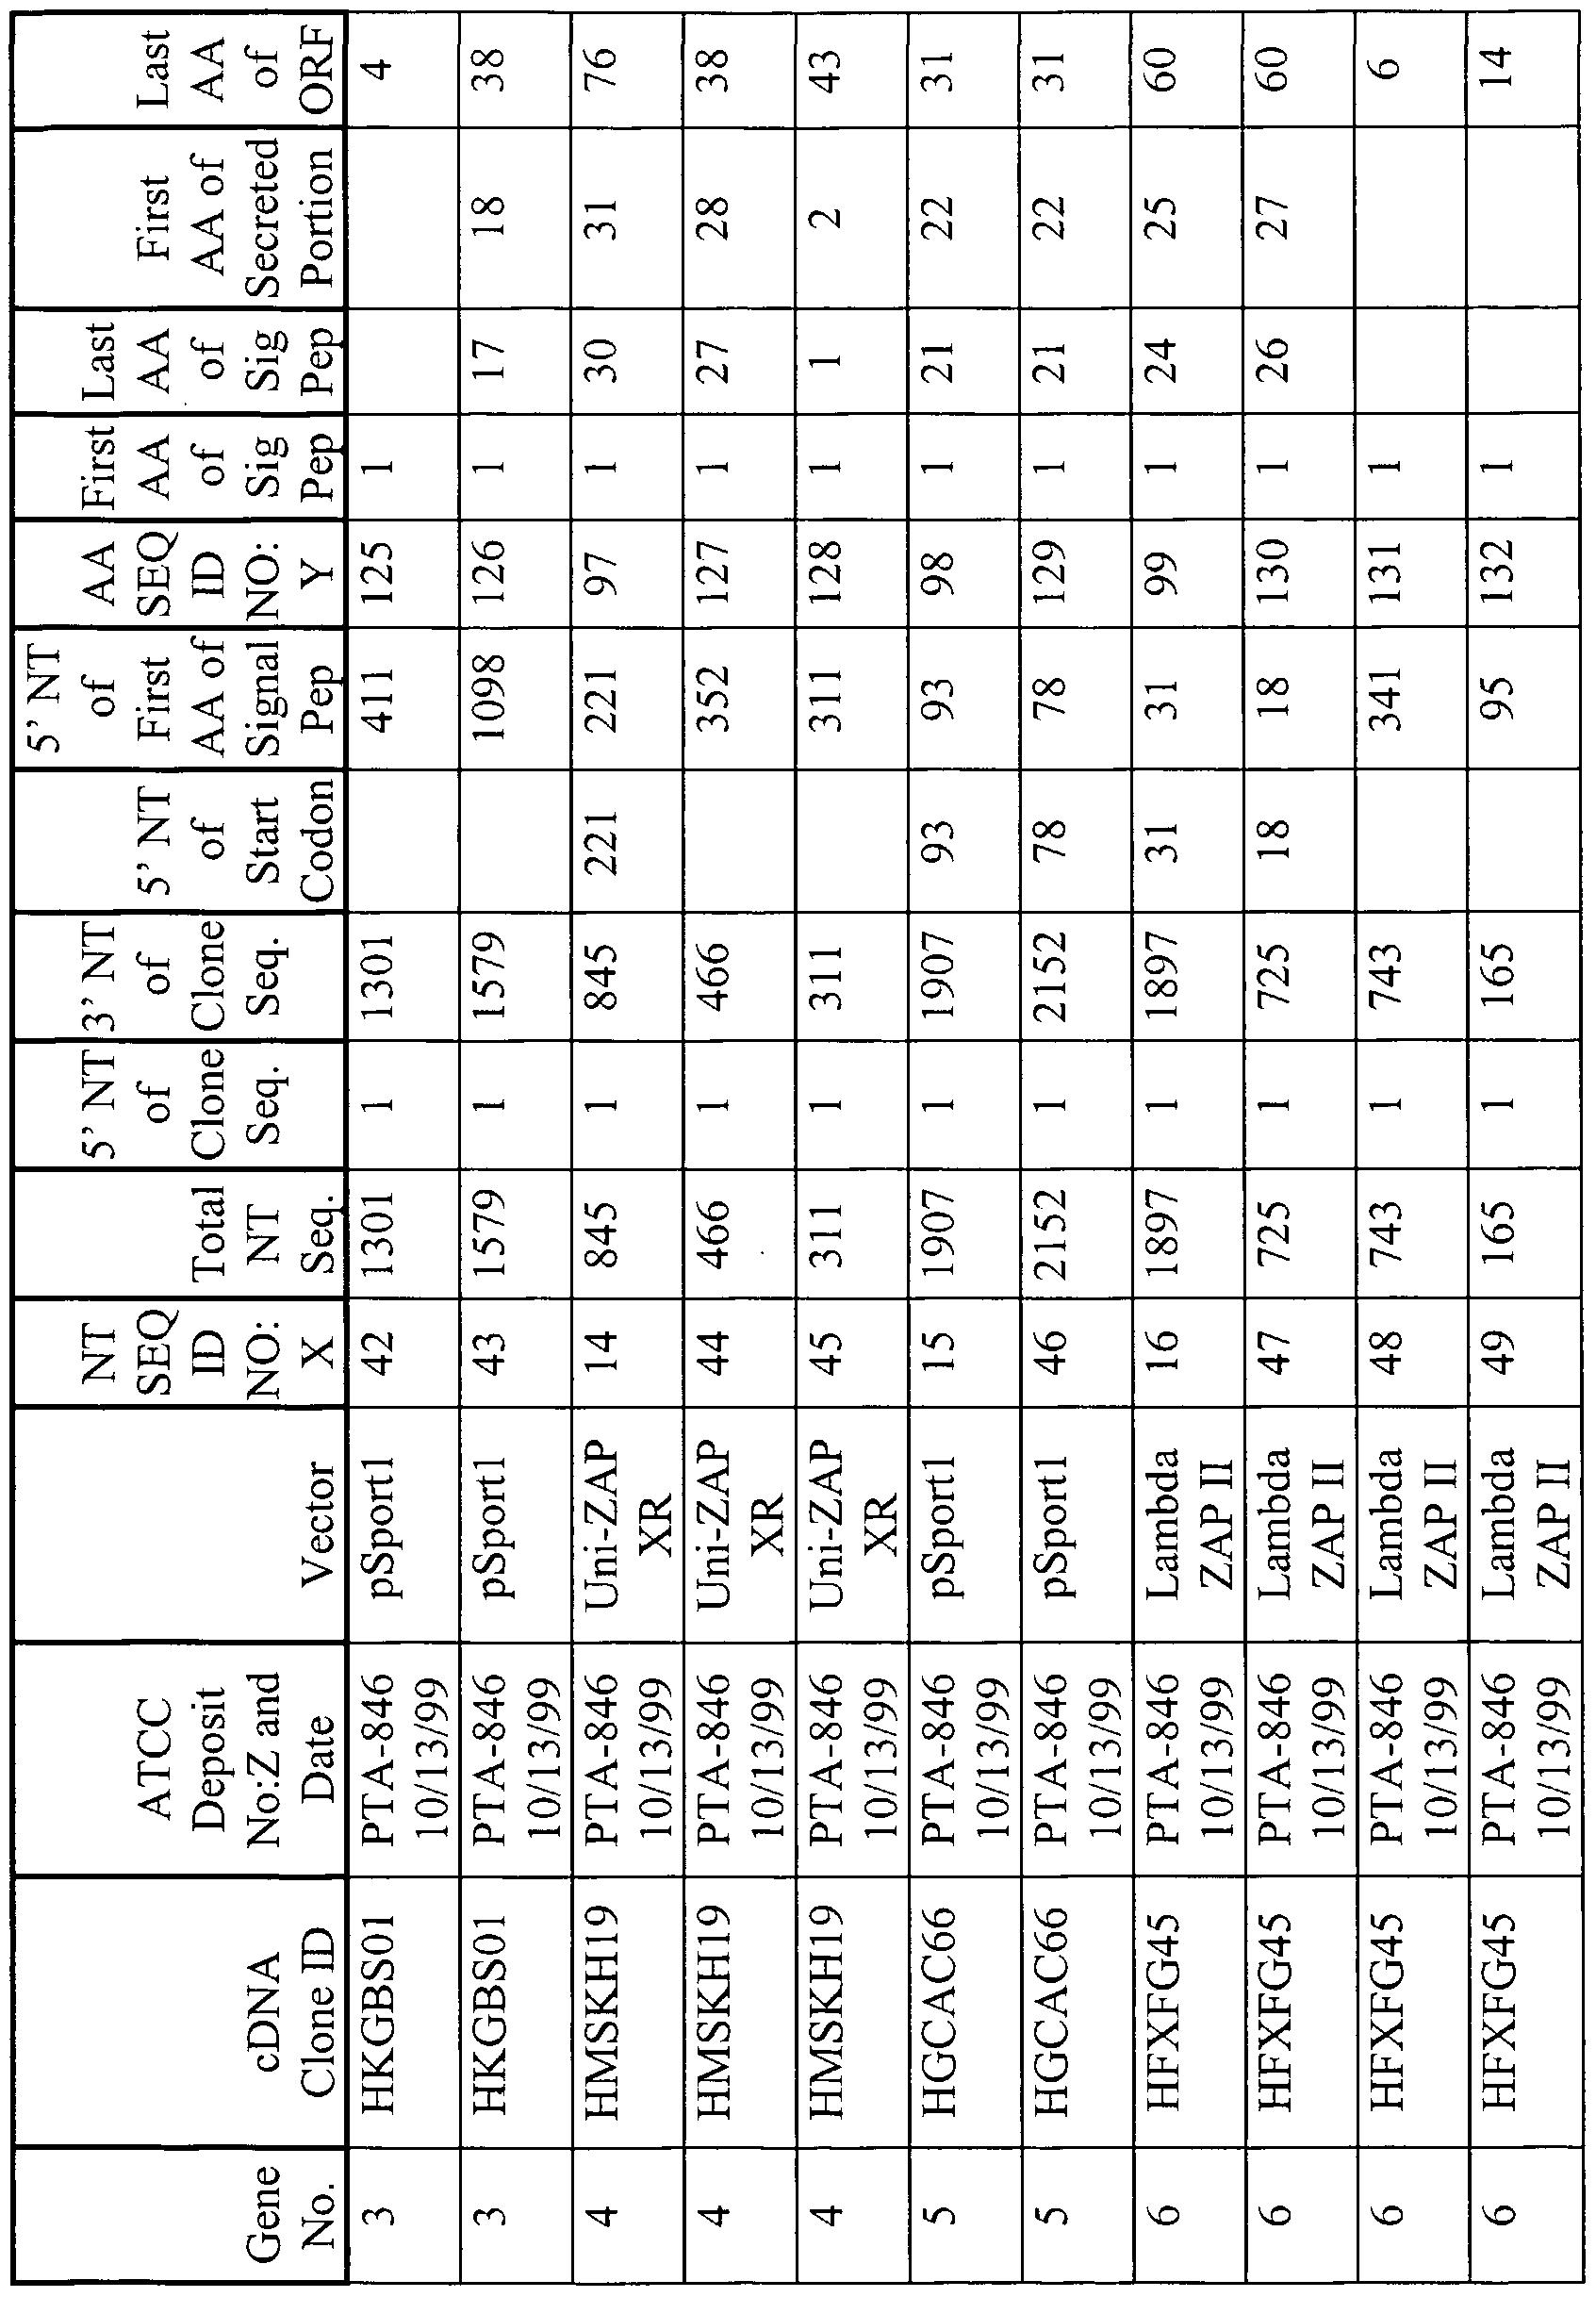 Takeuchi Tl10 Error Codes